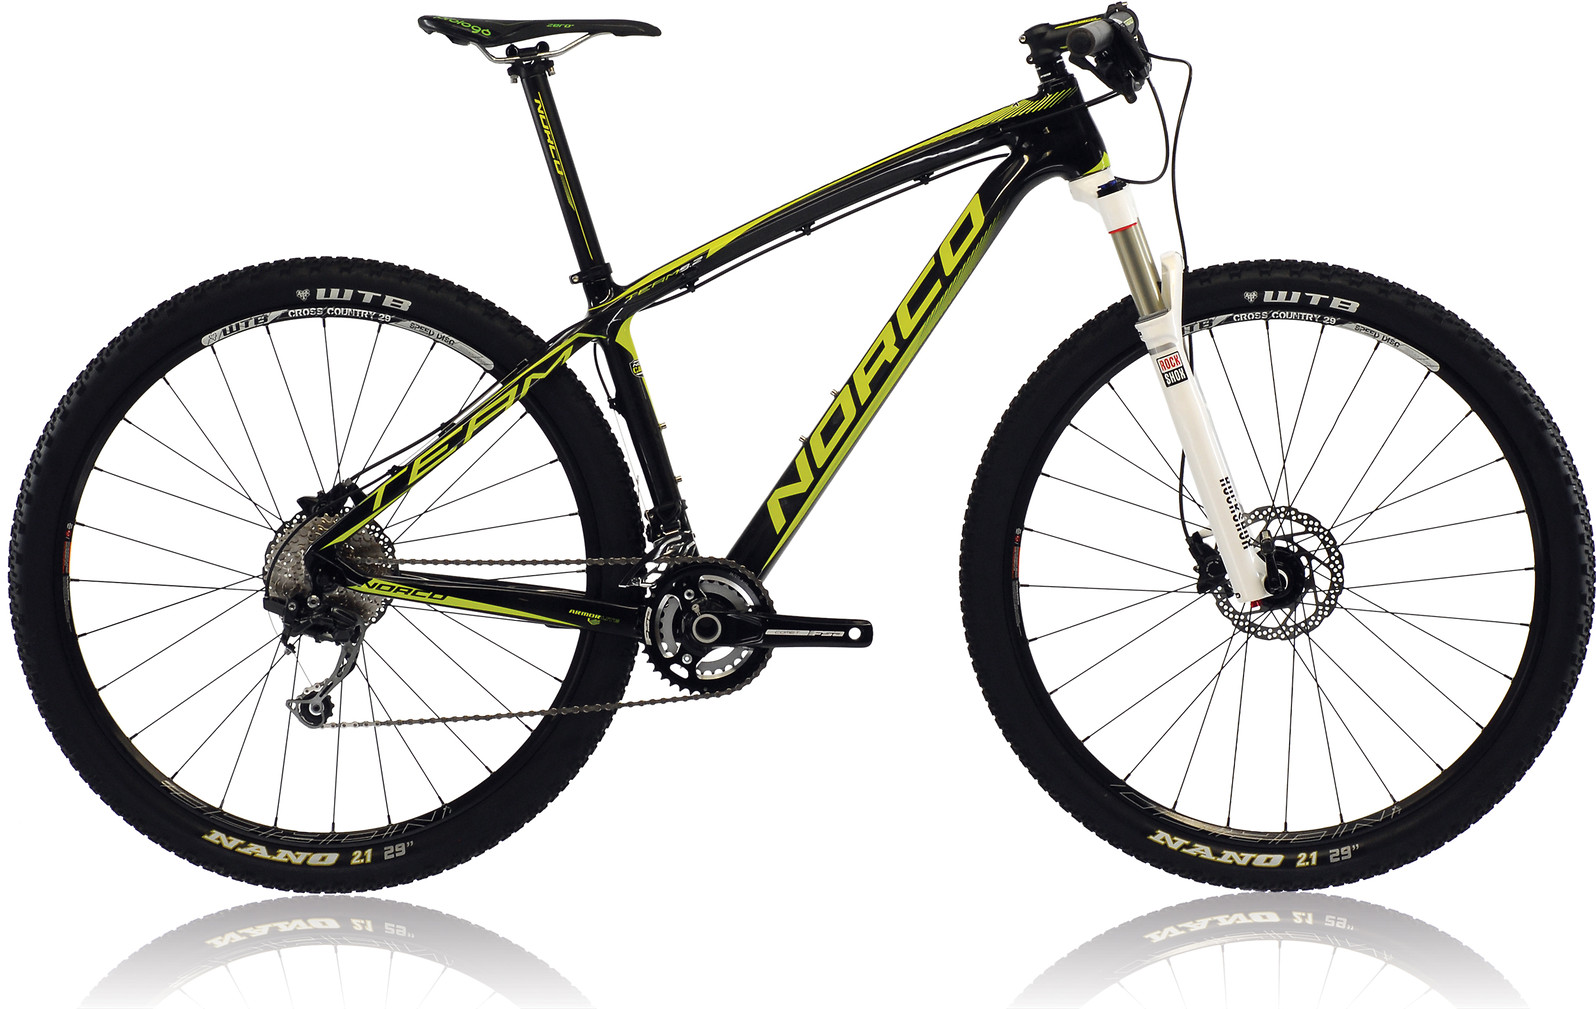 2013 Norco Team 9.2 Bike team-92-1